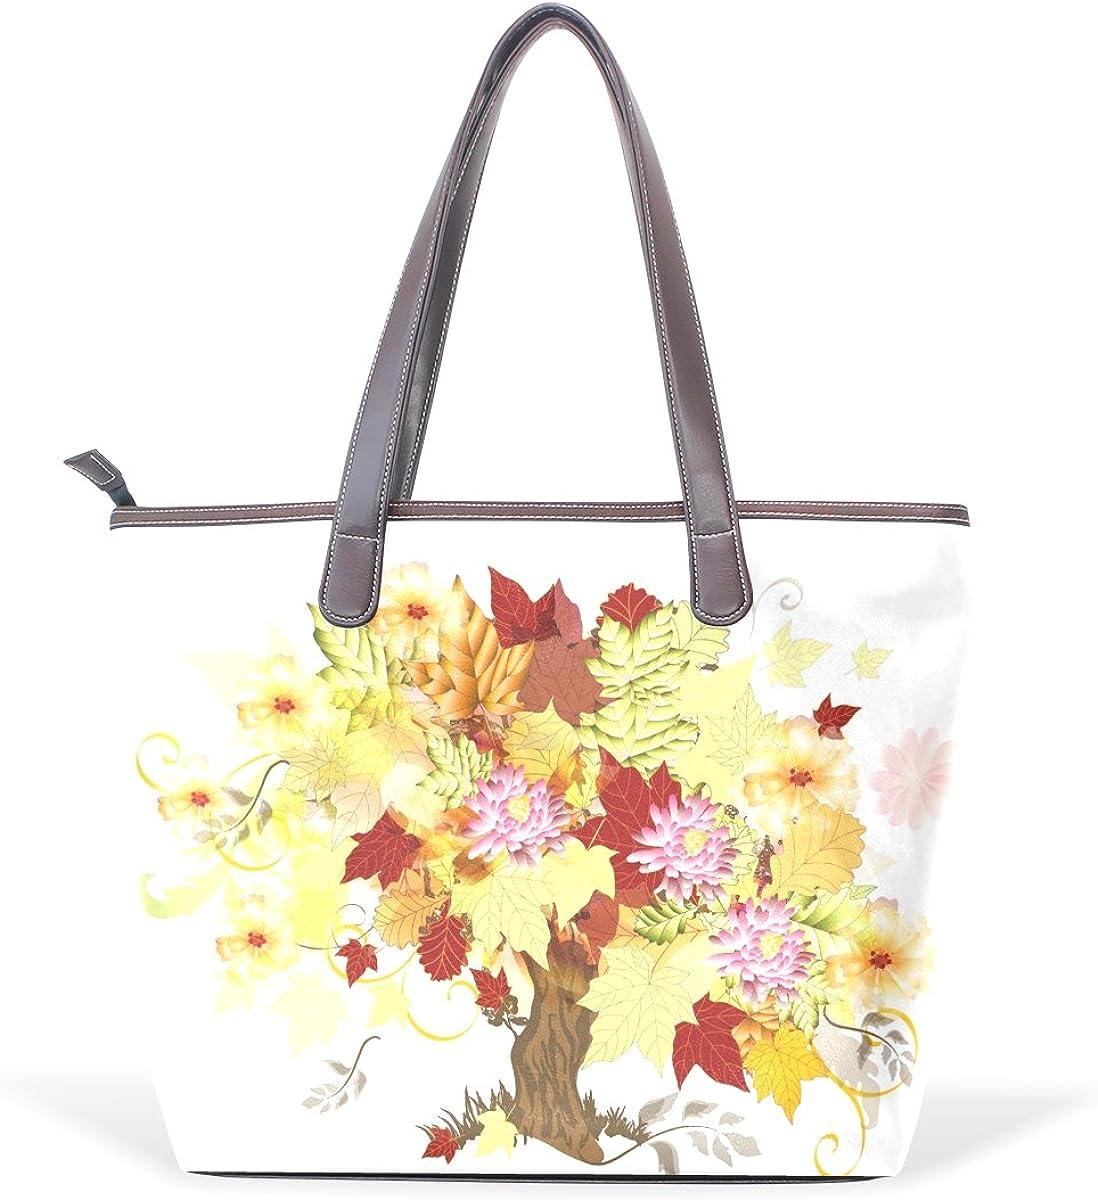 IMOBABY Women Leather Tote Top Handle Tote Shoulder Bags Handbags Art Tree Background for Girls Ladies